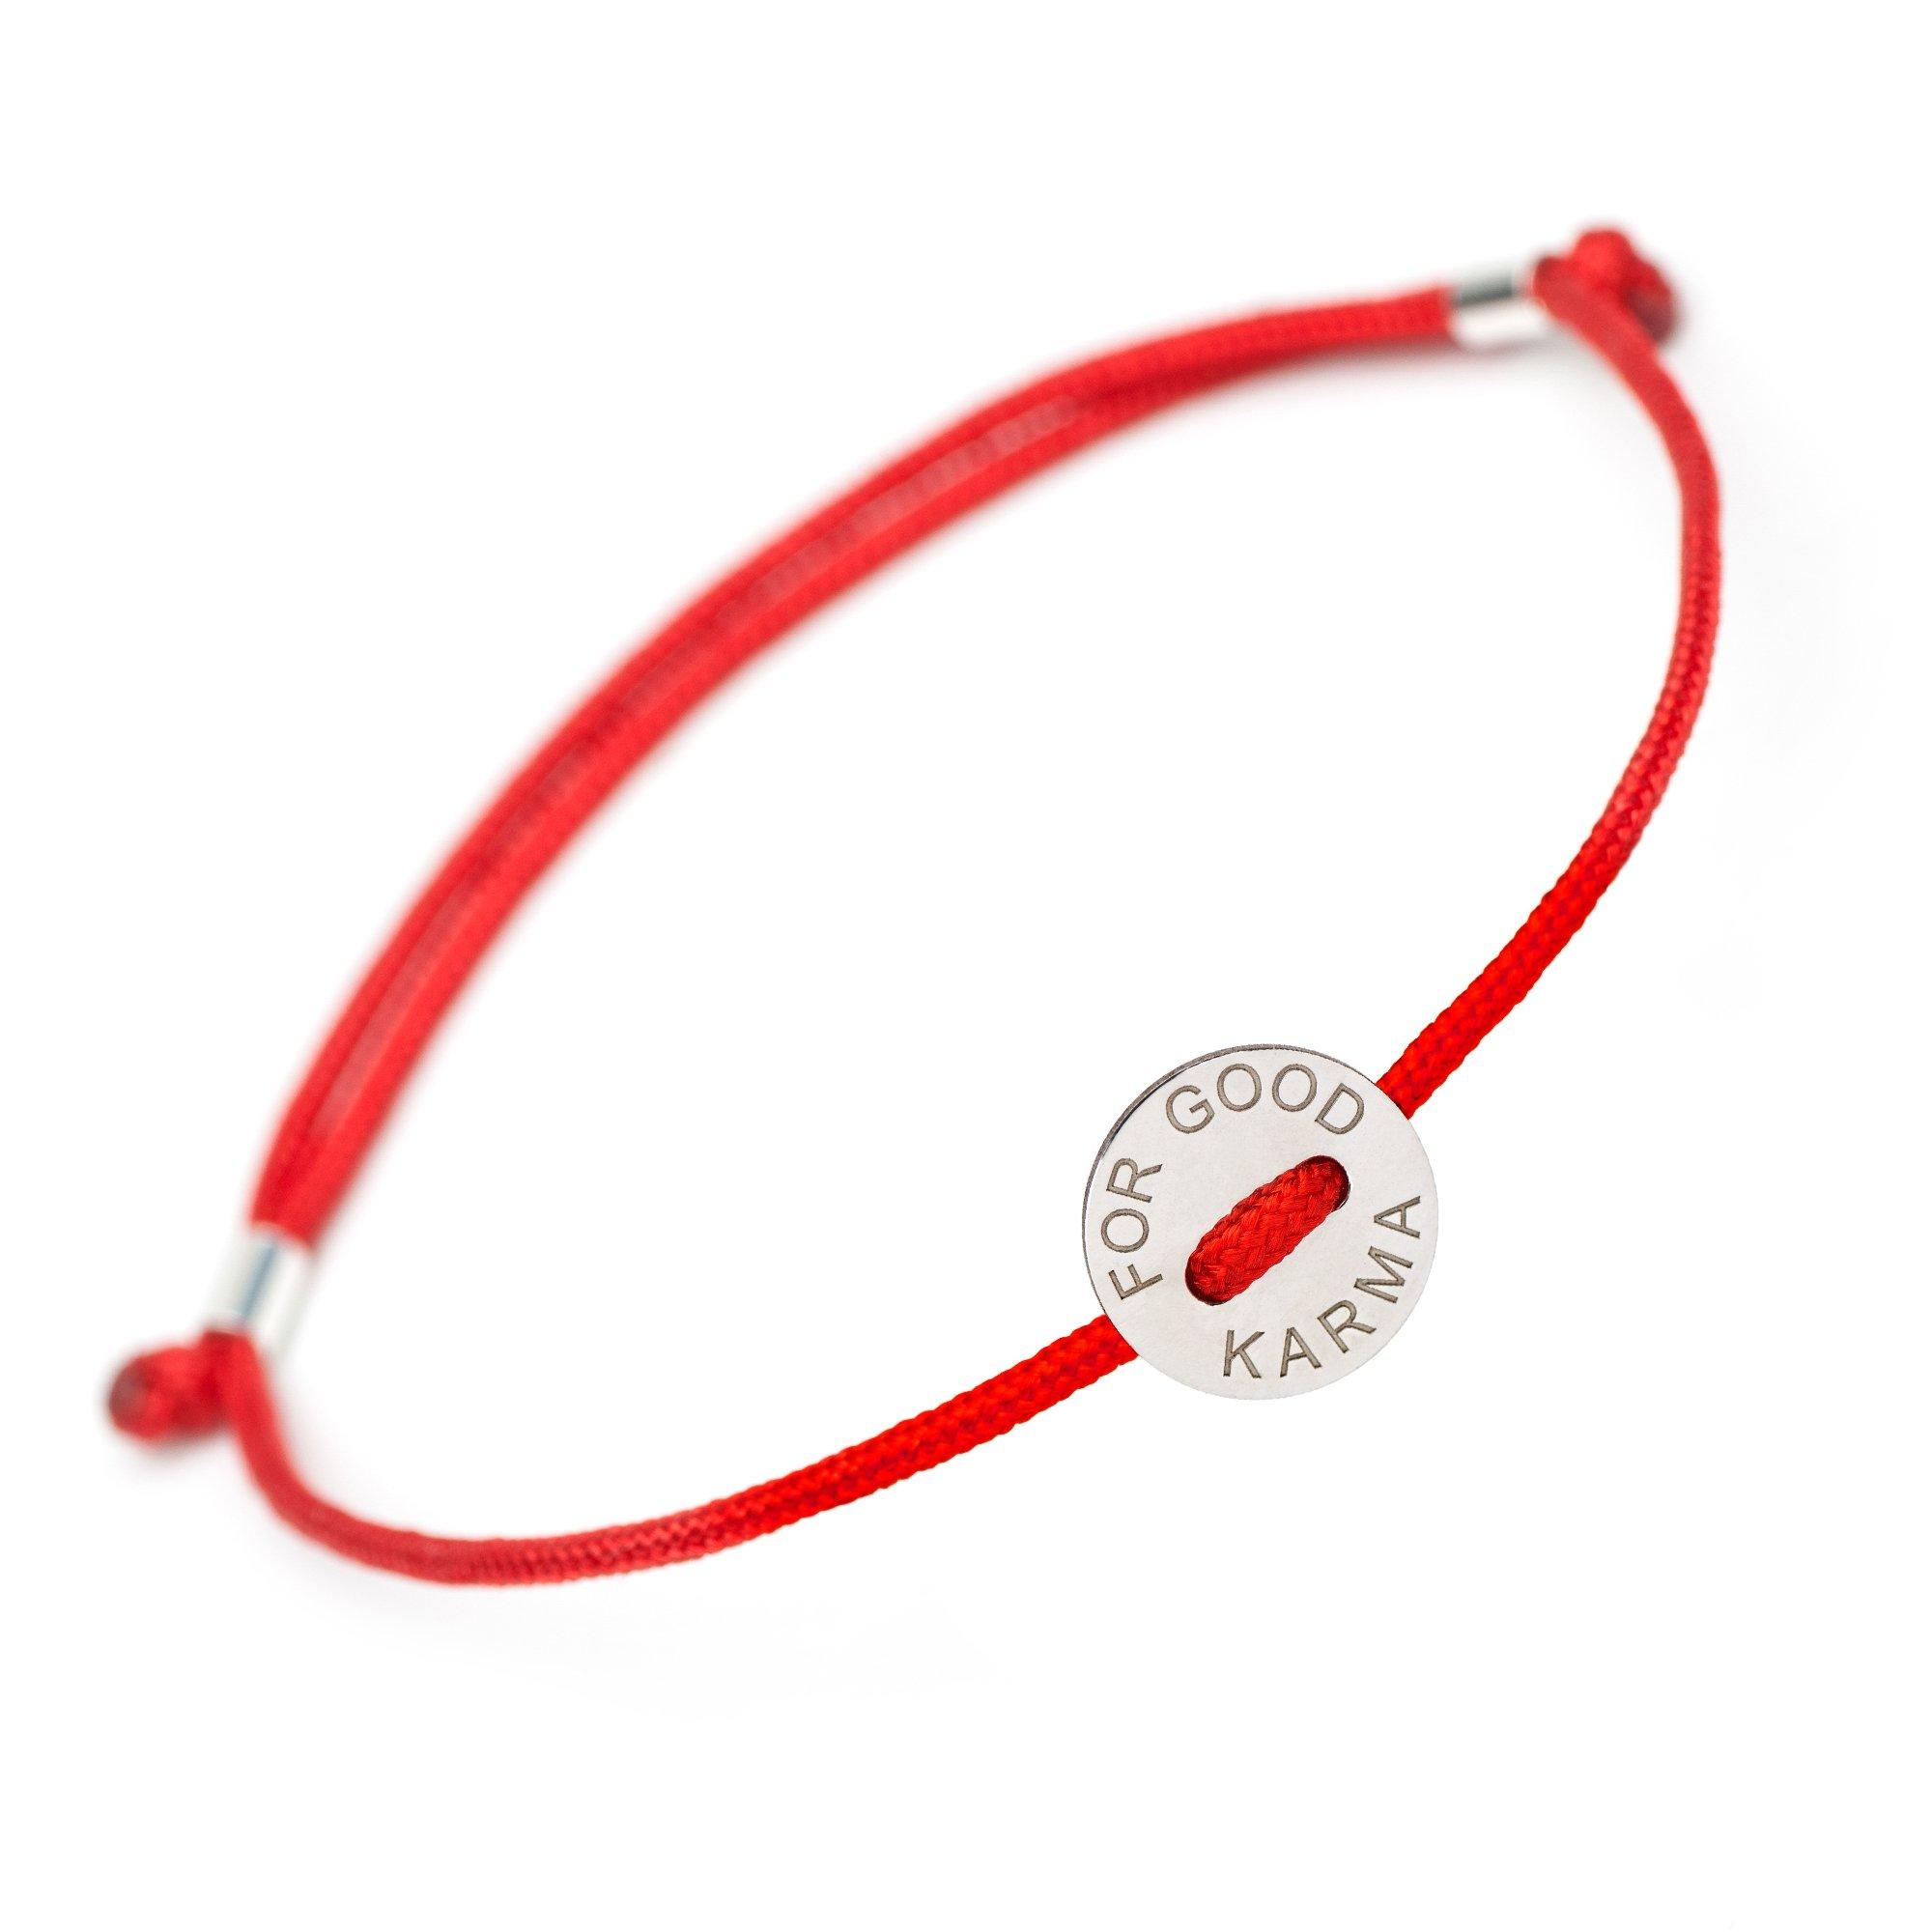 Friendship Inspirational Motivational Lucky Bracelet - For Good Karma Engraved Coin Charm - Perfect Fashion Protection Red Bracelet - Adjustable Bangle Bracelets Gifts Men Women Friend Girls Boys